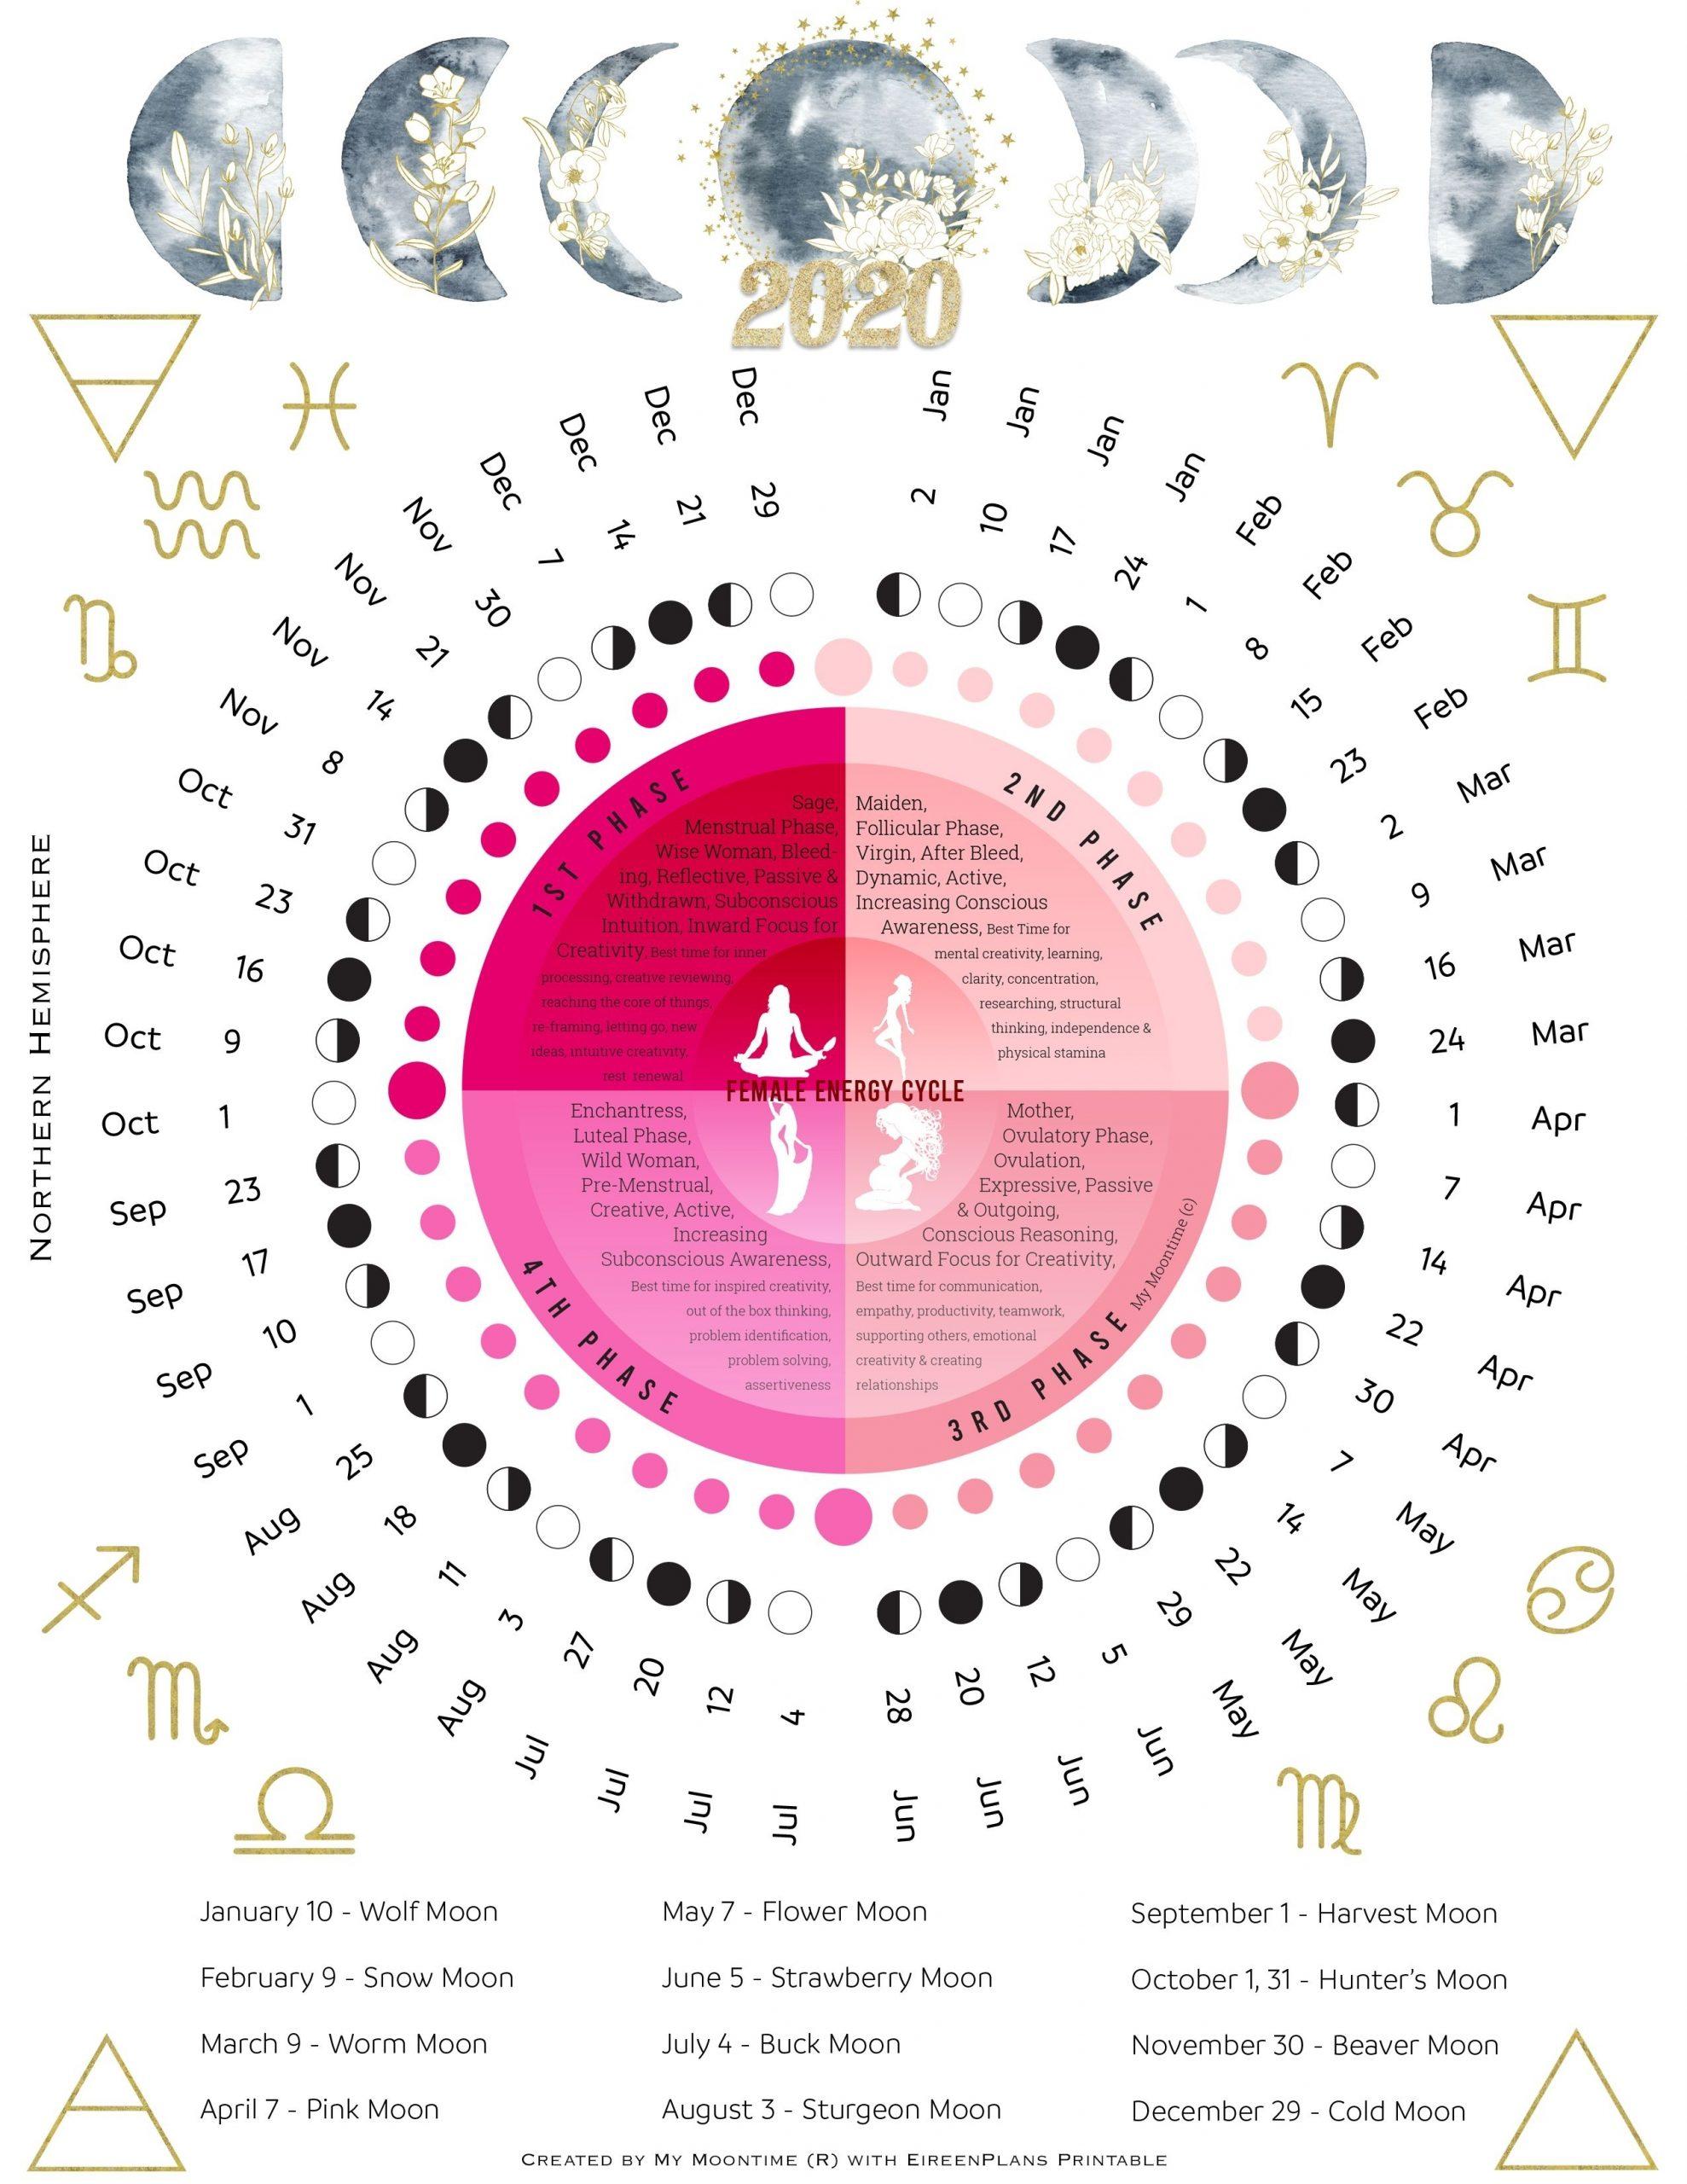 2020 Moon Calendar In 2020 | Moon Calendar, Menstrual